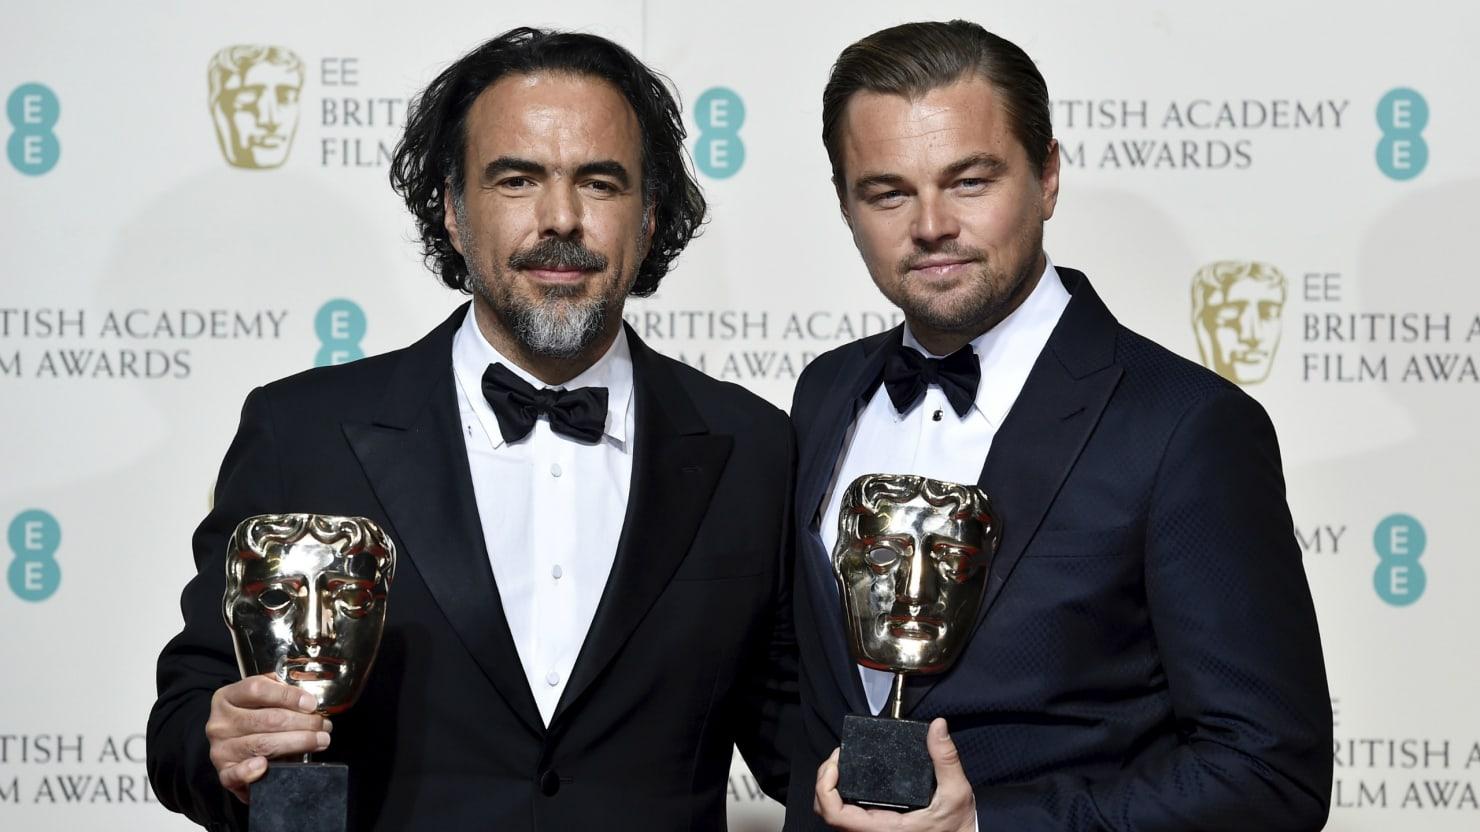 Bafta Awards: How To Watch 2017 BAFTA Awards Live Stream Performers Full